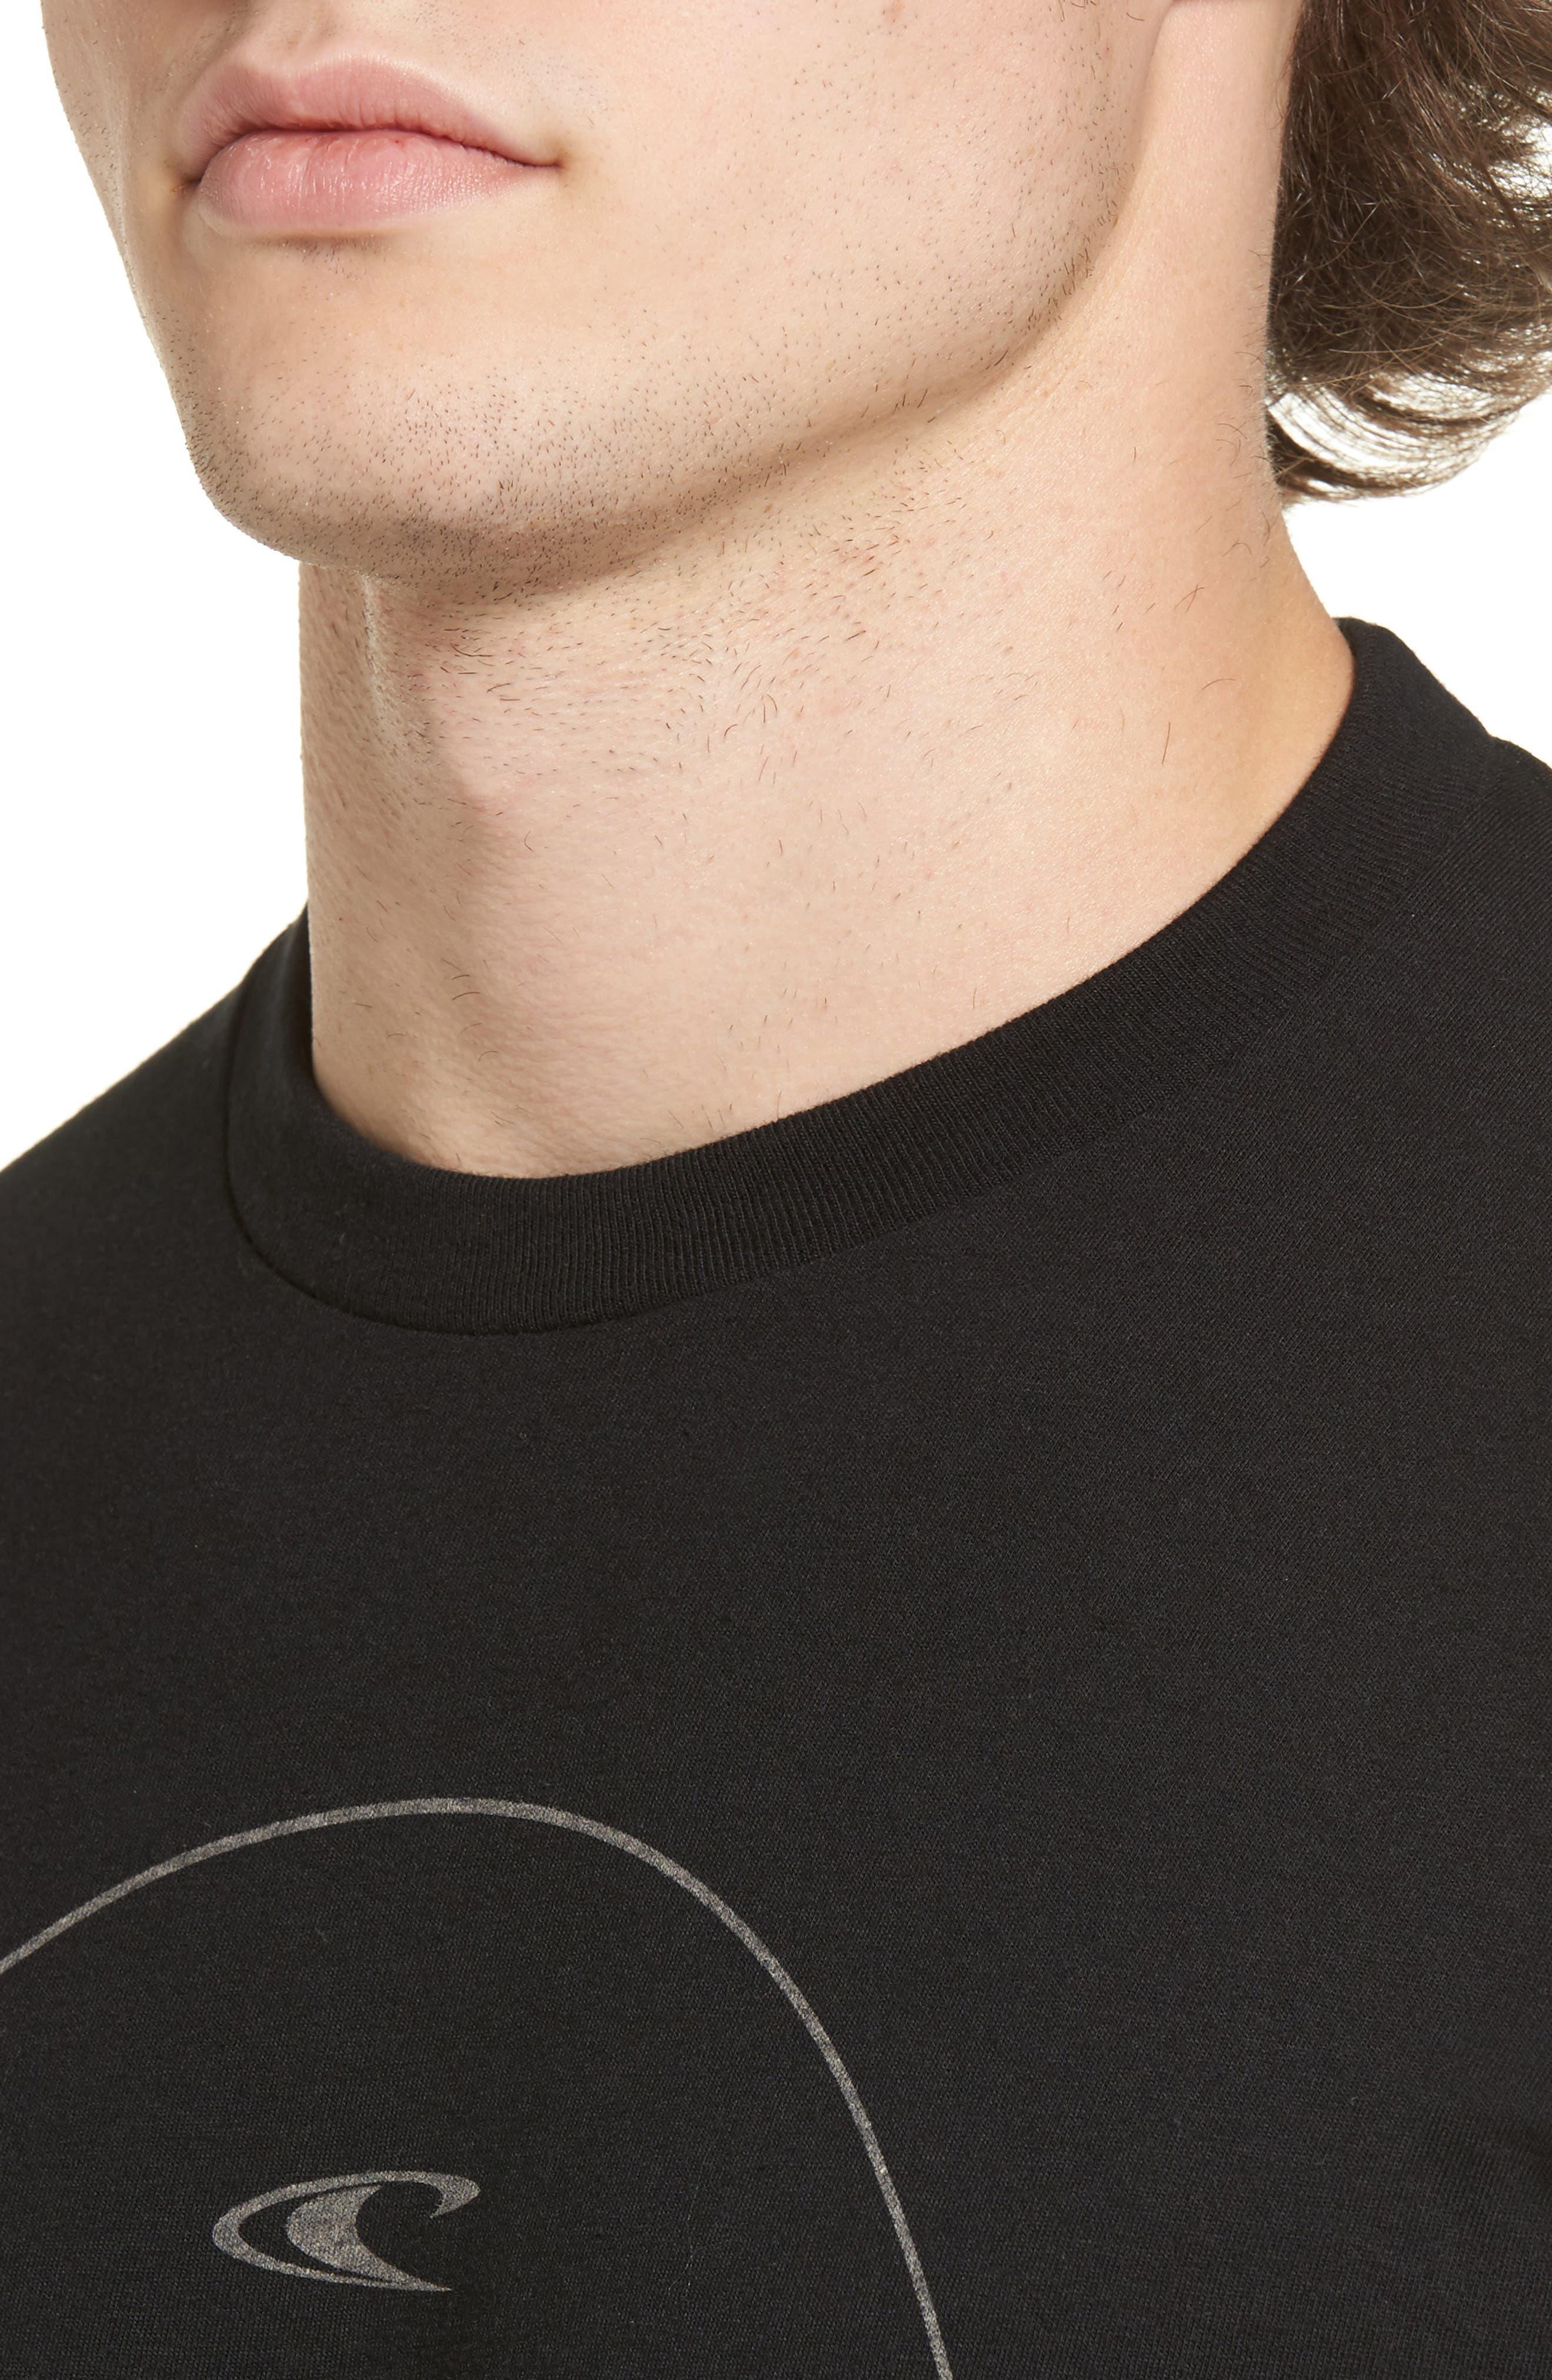 Agent Logo Graphic T-Shirt,                             Alternate thumbnail 4, color,                             003